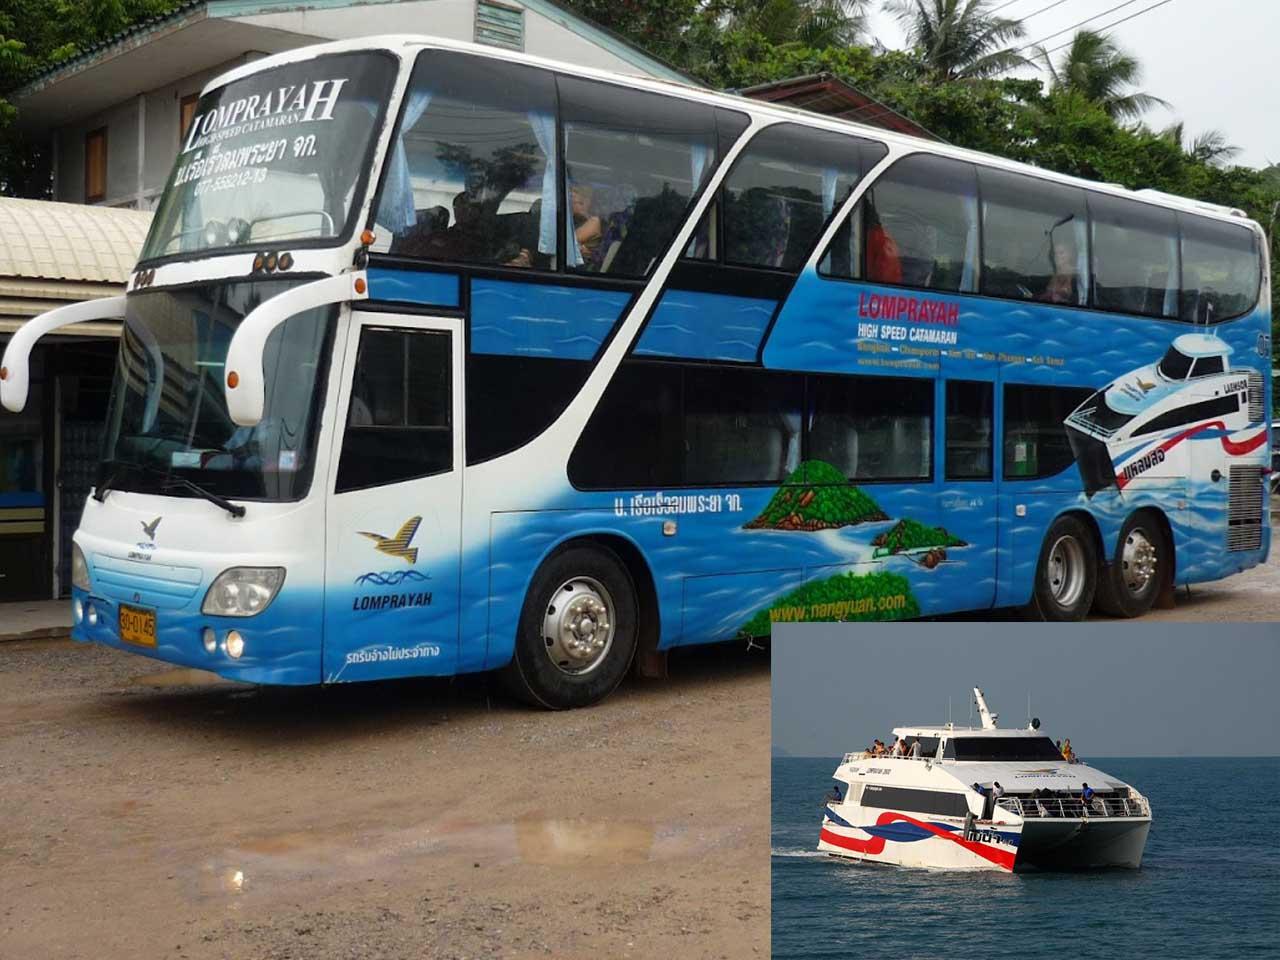 Lomprayah autobus i katamaran